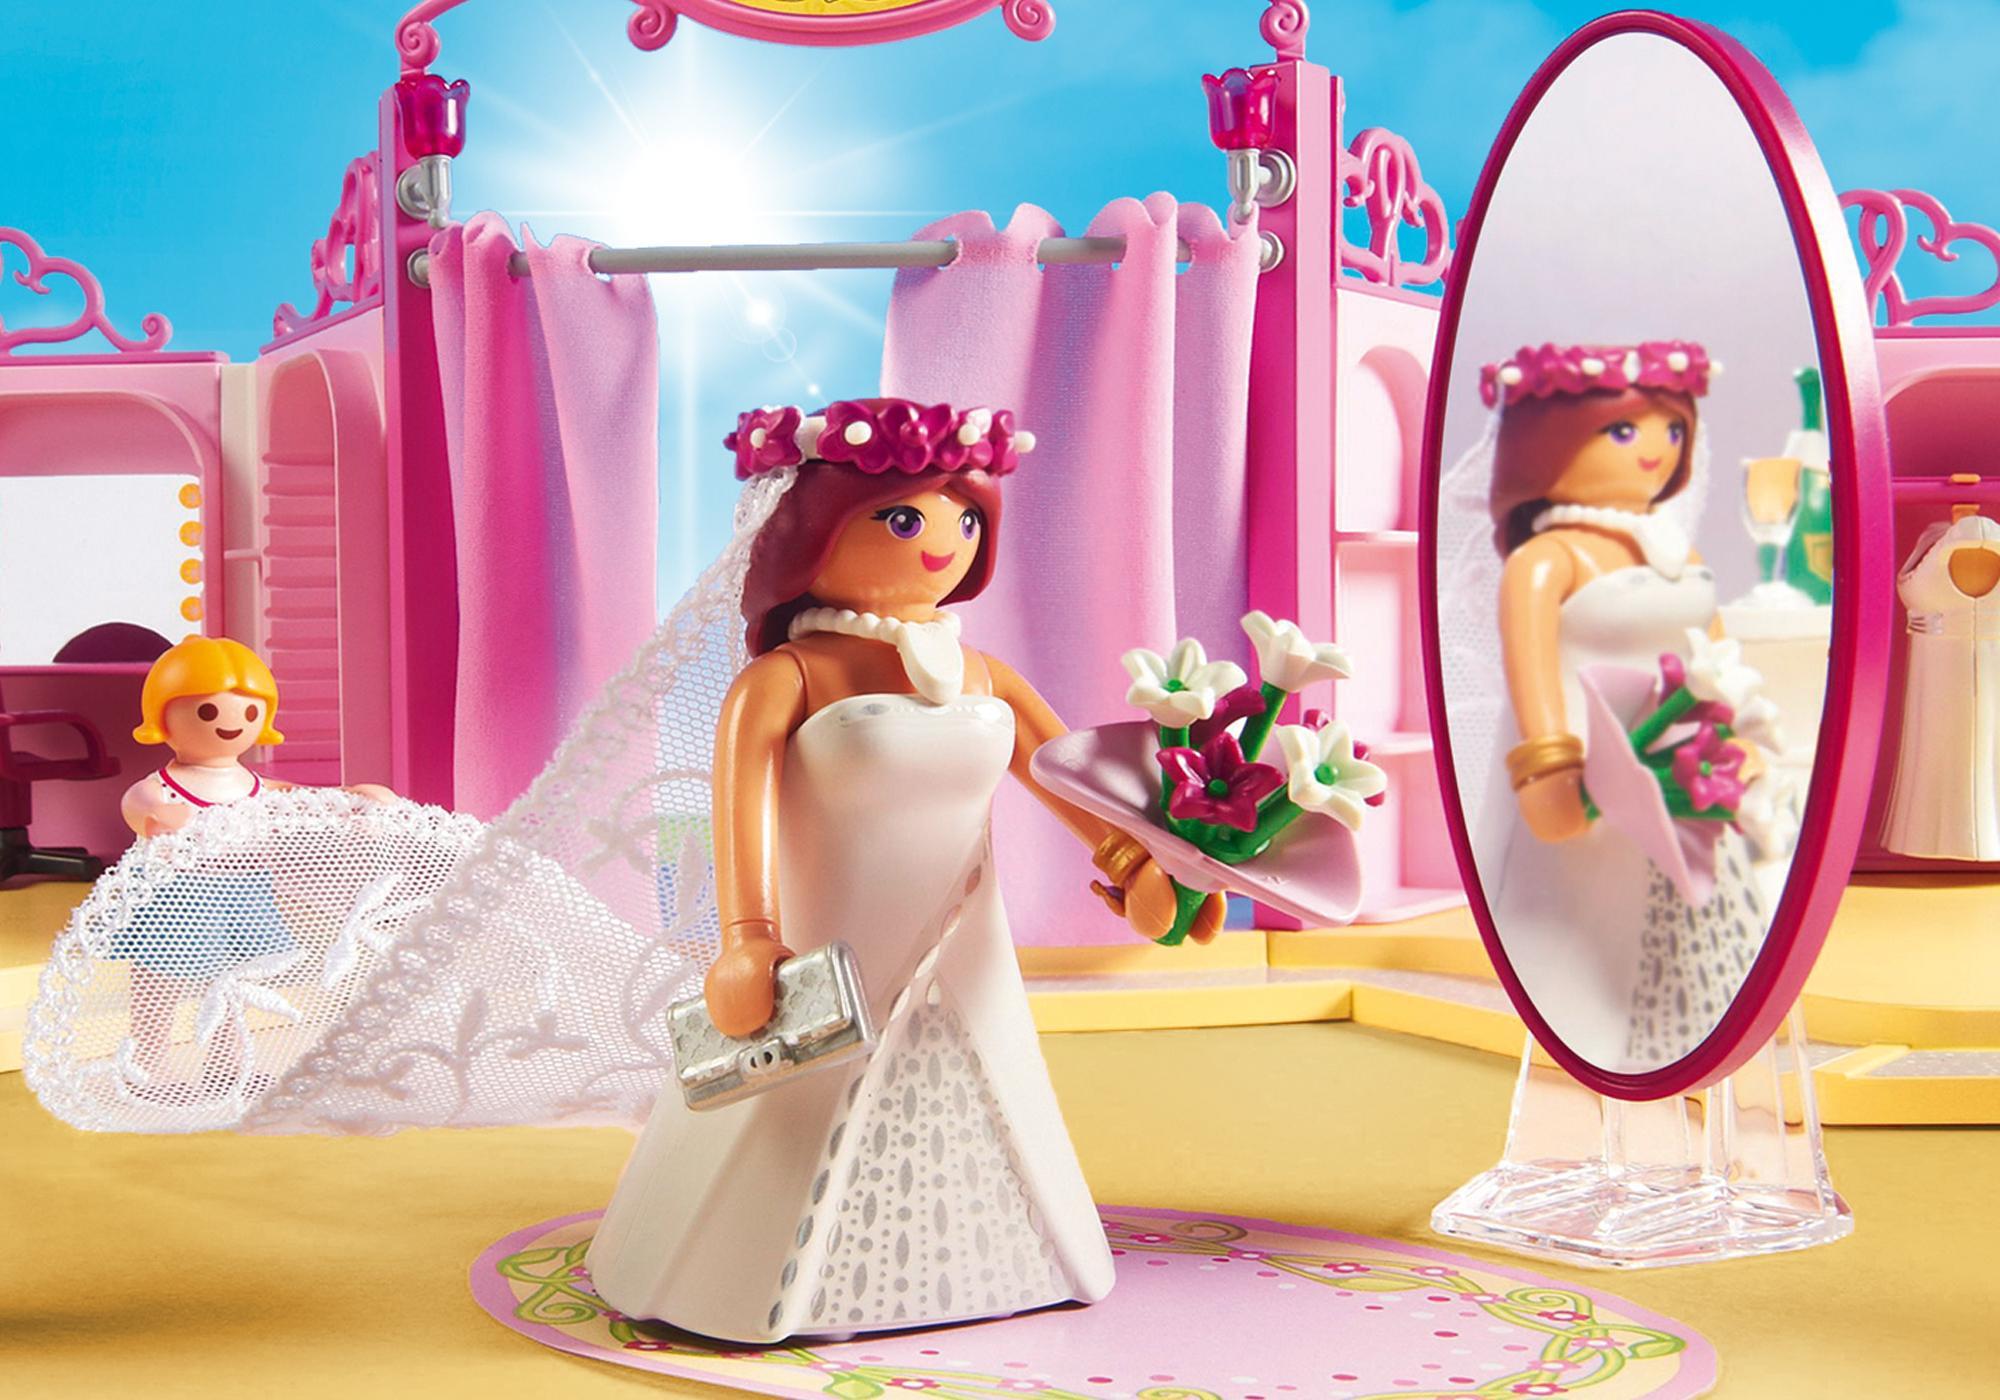 http://media.playmobil.com/i/playmobil/9226_product_extra2/Κατάστημα νυφικών με σαλόνι ομορφιάς